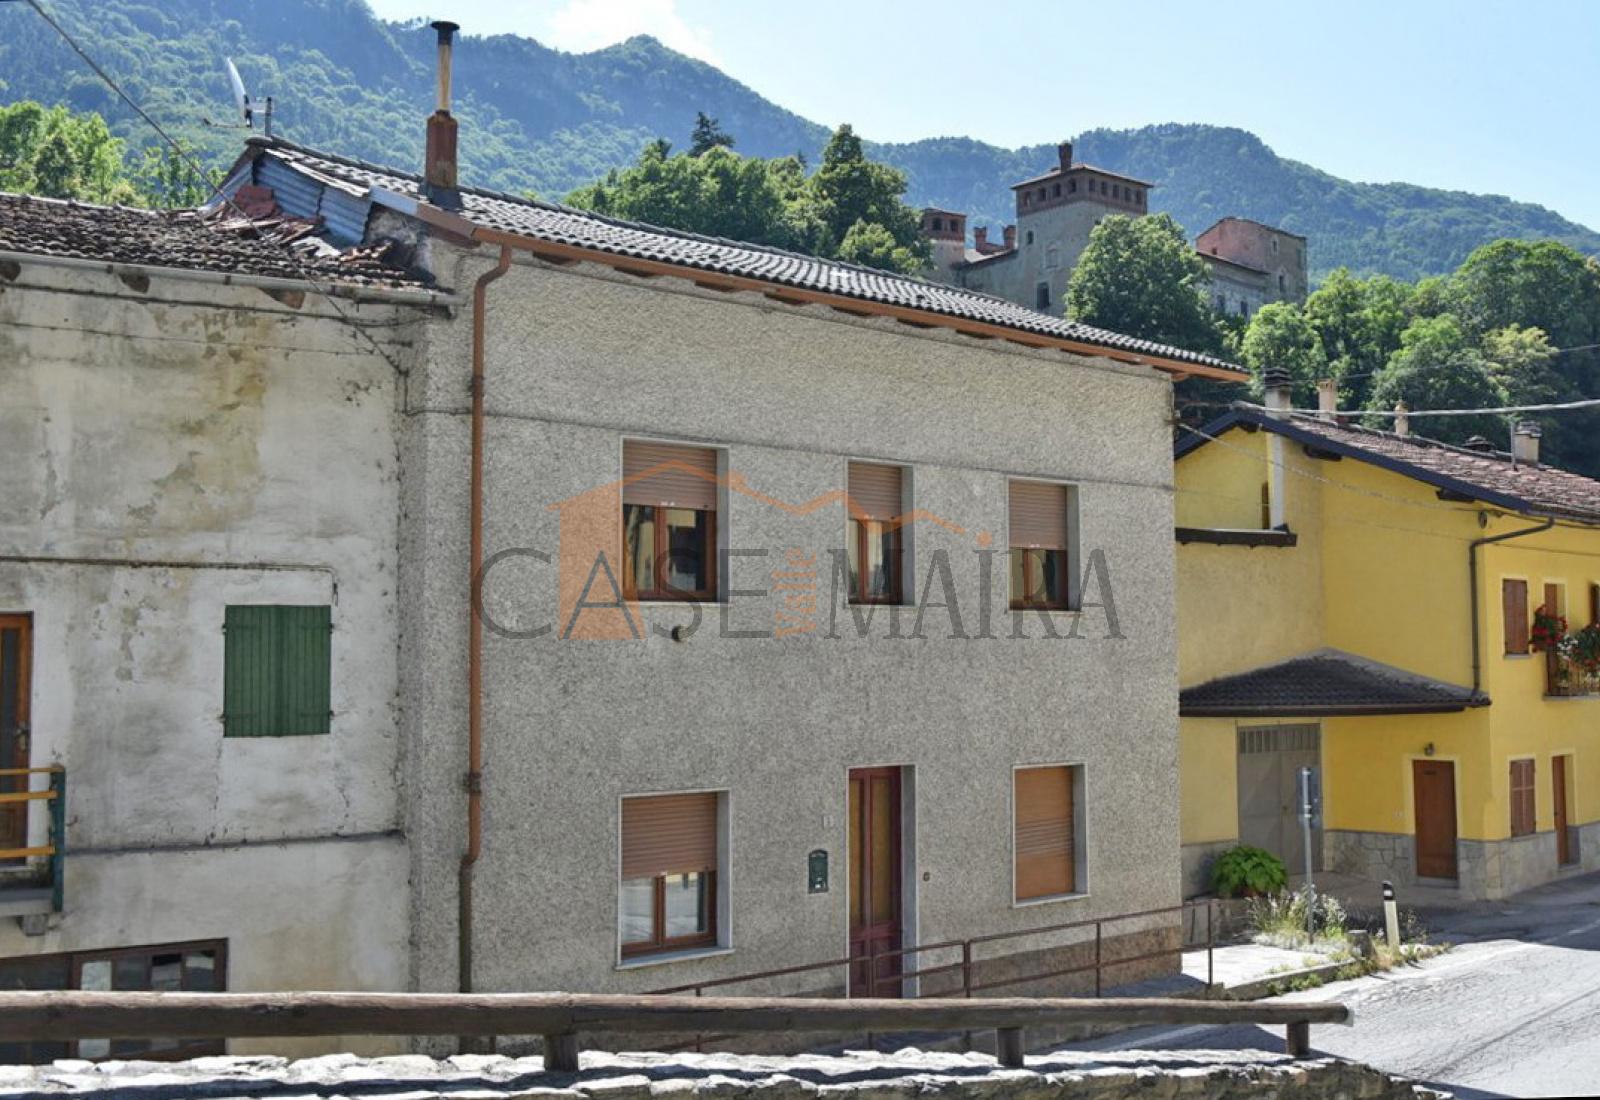 Via Provinciale, CARTIGNANO, 4 Stanze da Letto Stanze da Letto, ,Casa,In vendita,Via Provinciale,1081